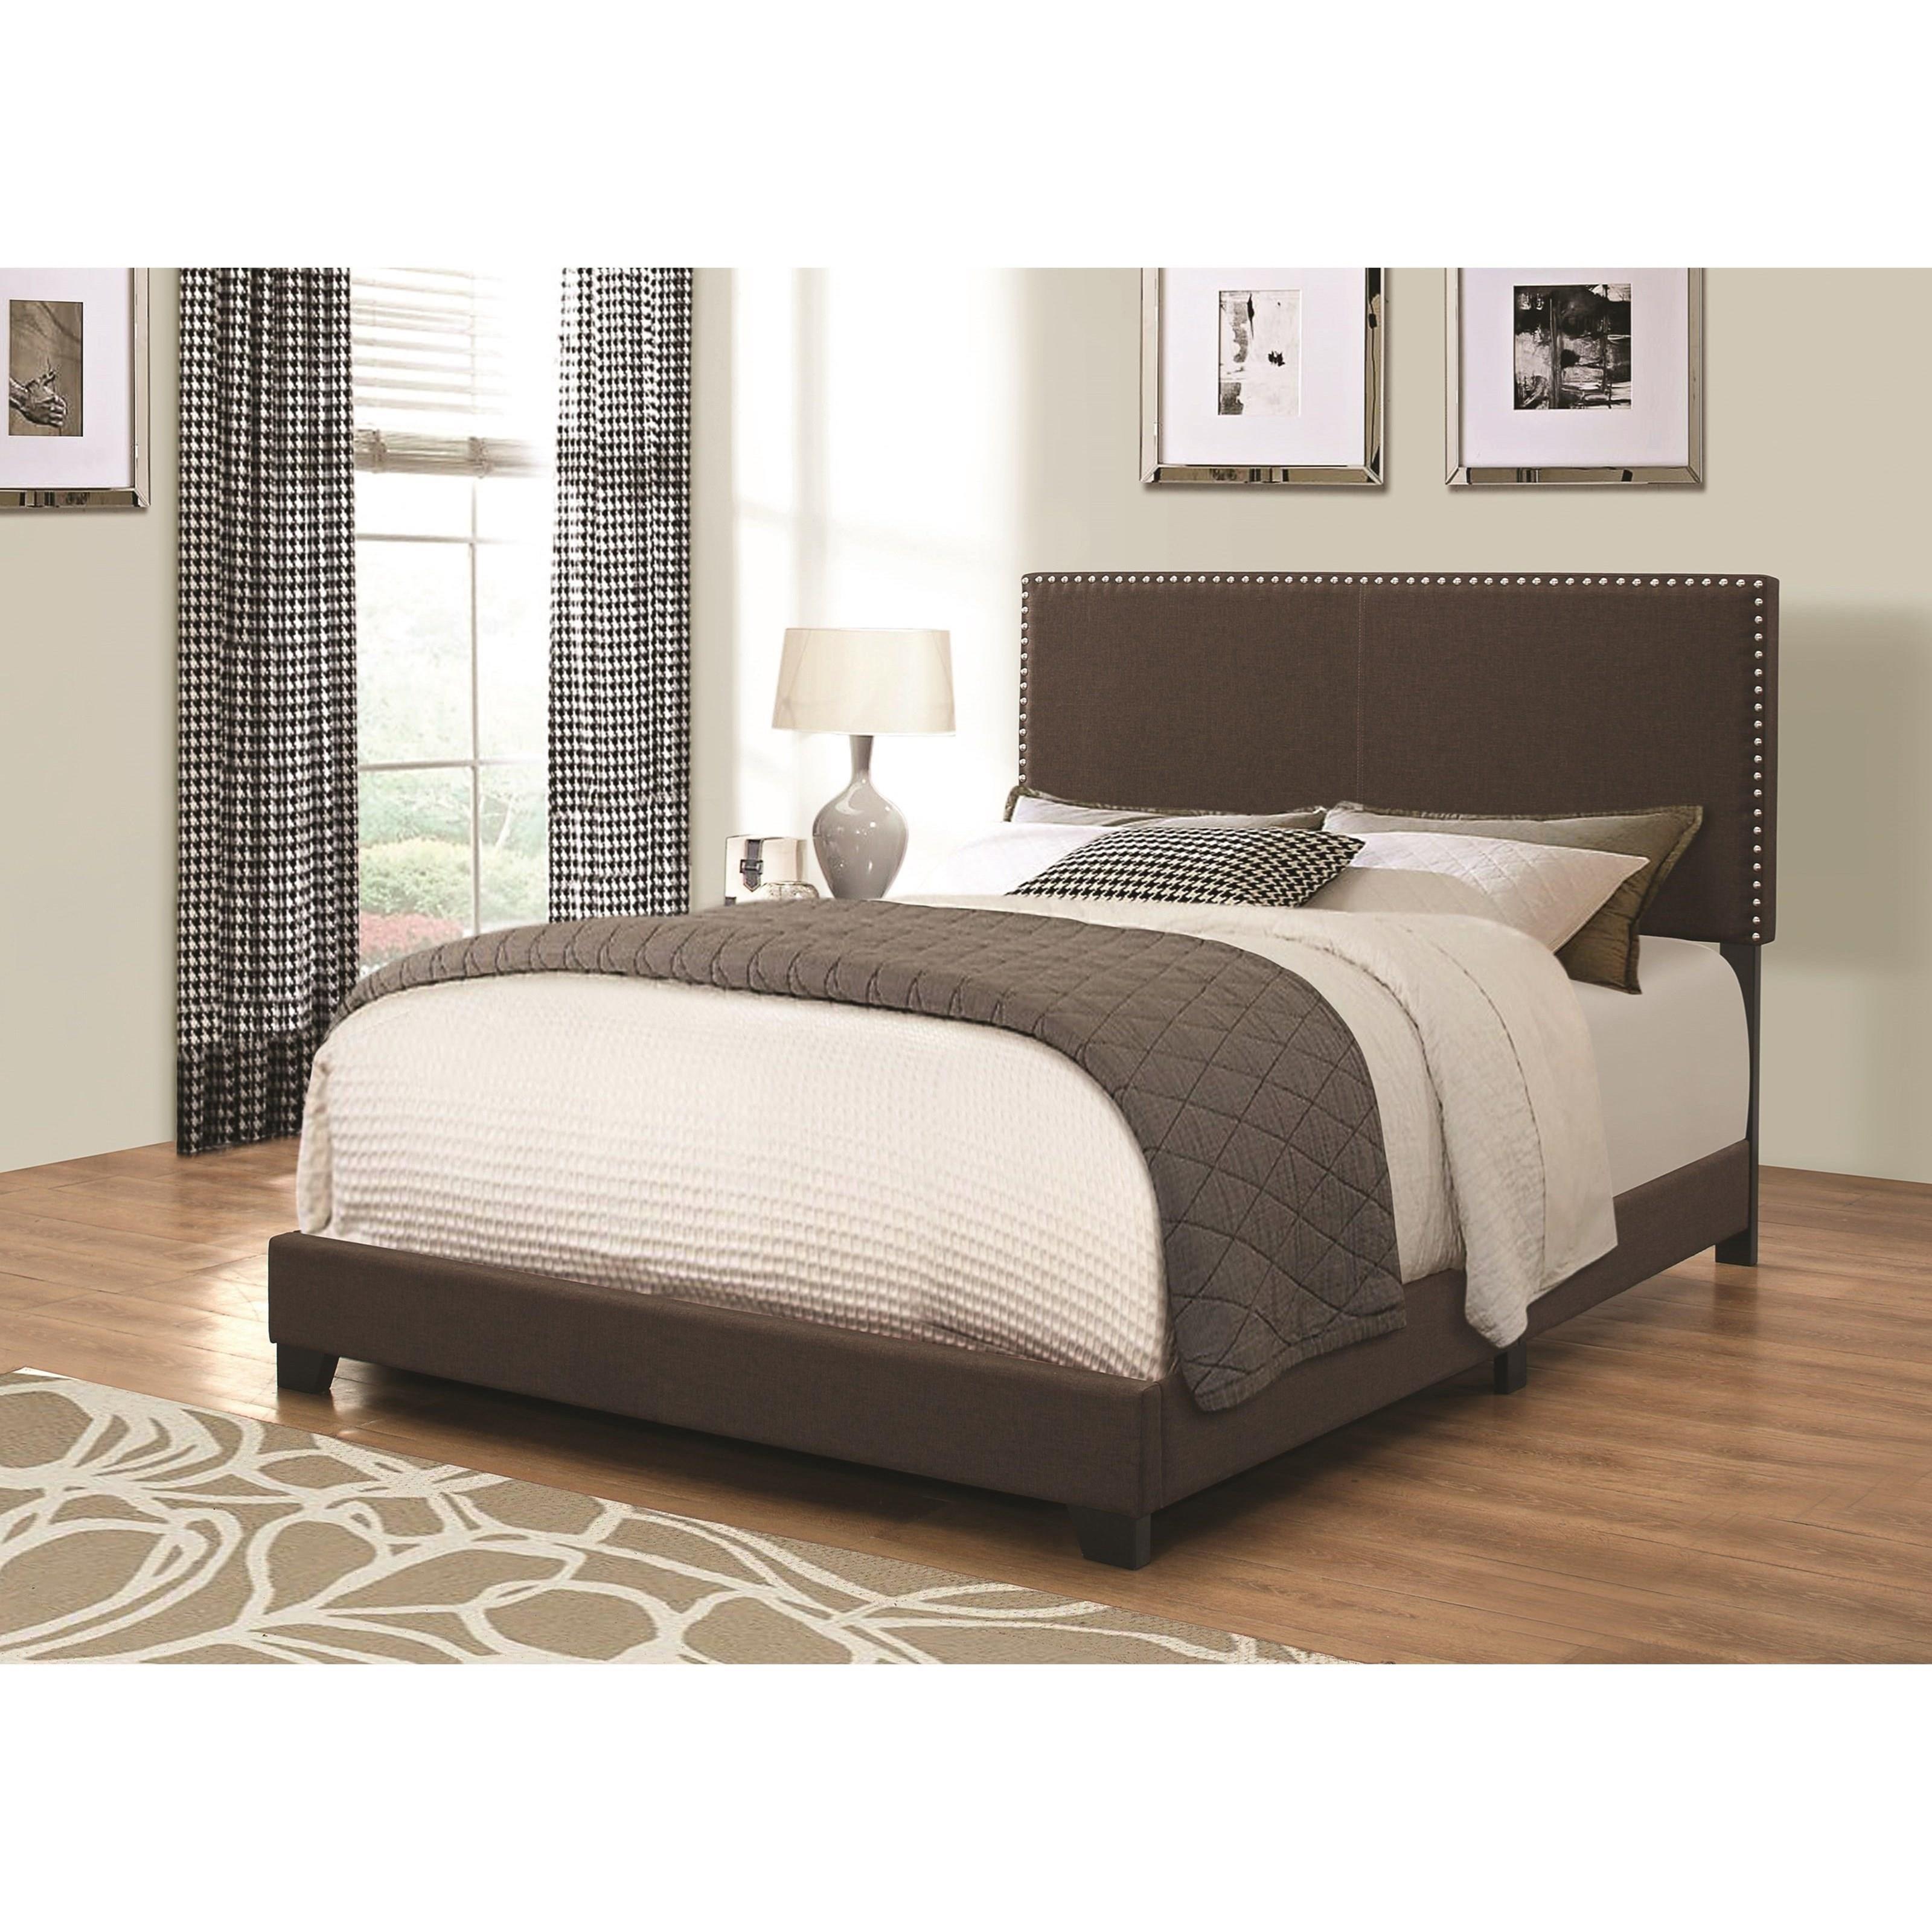 Coaster Upholstered Beds Cal King Bed - Item Number: 350081KW